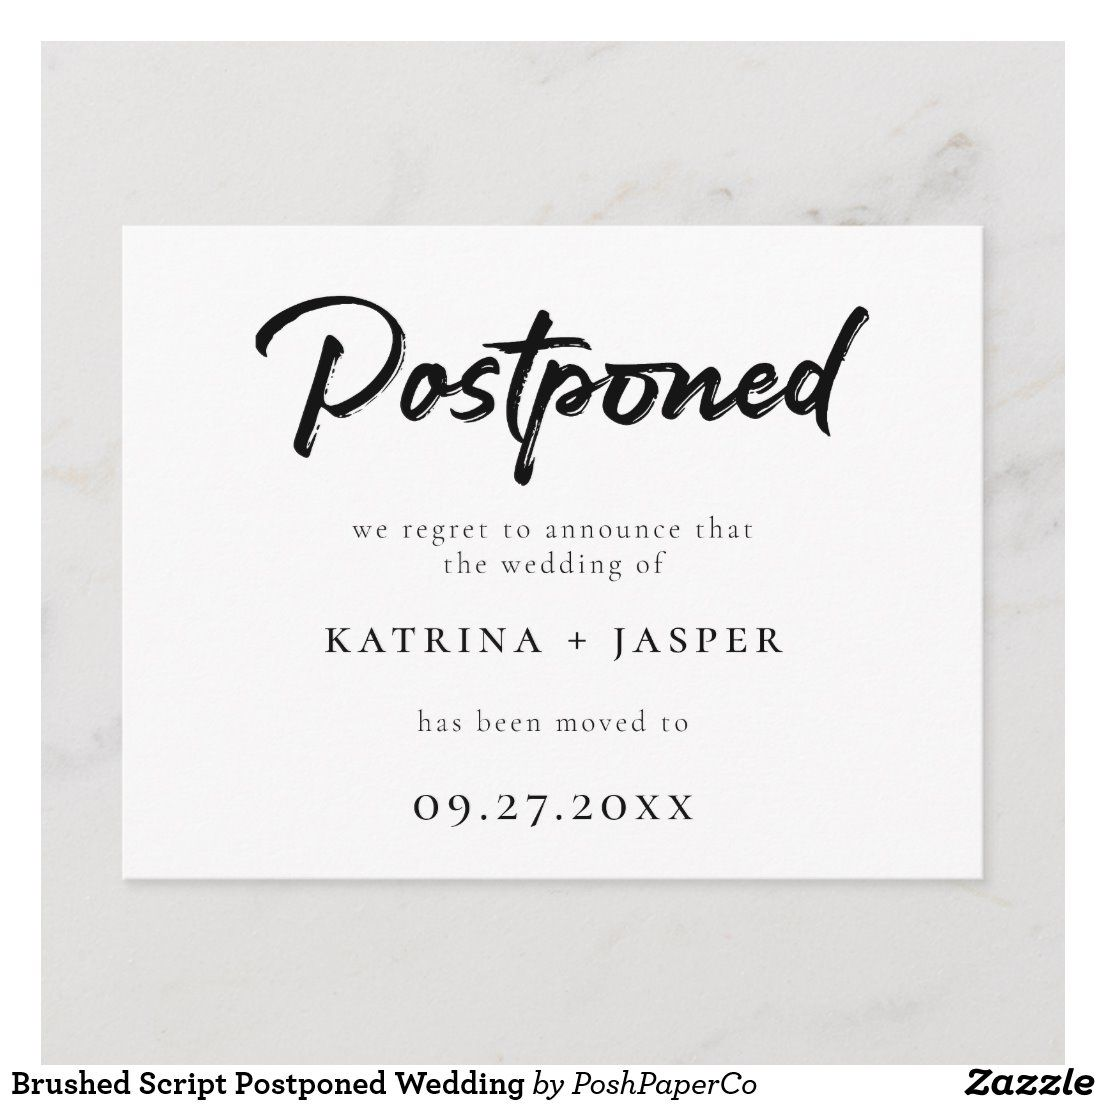 Brushed script postponed wedding announcement postcard